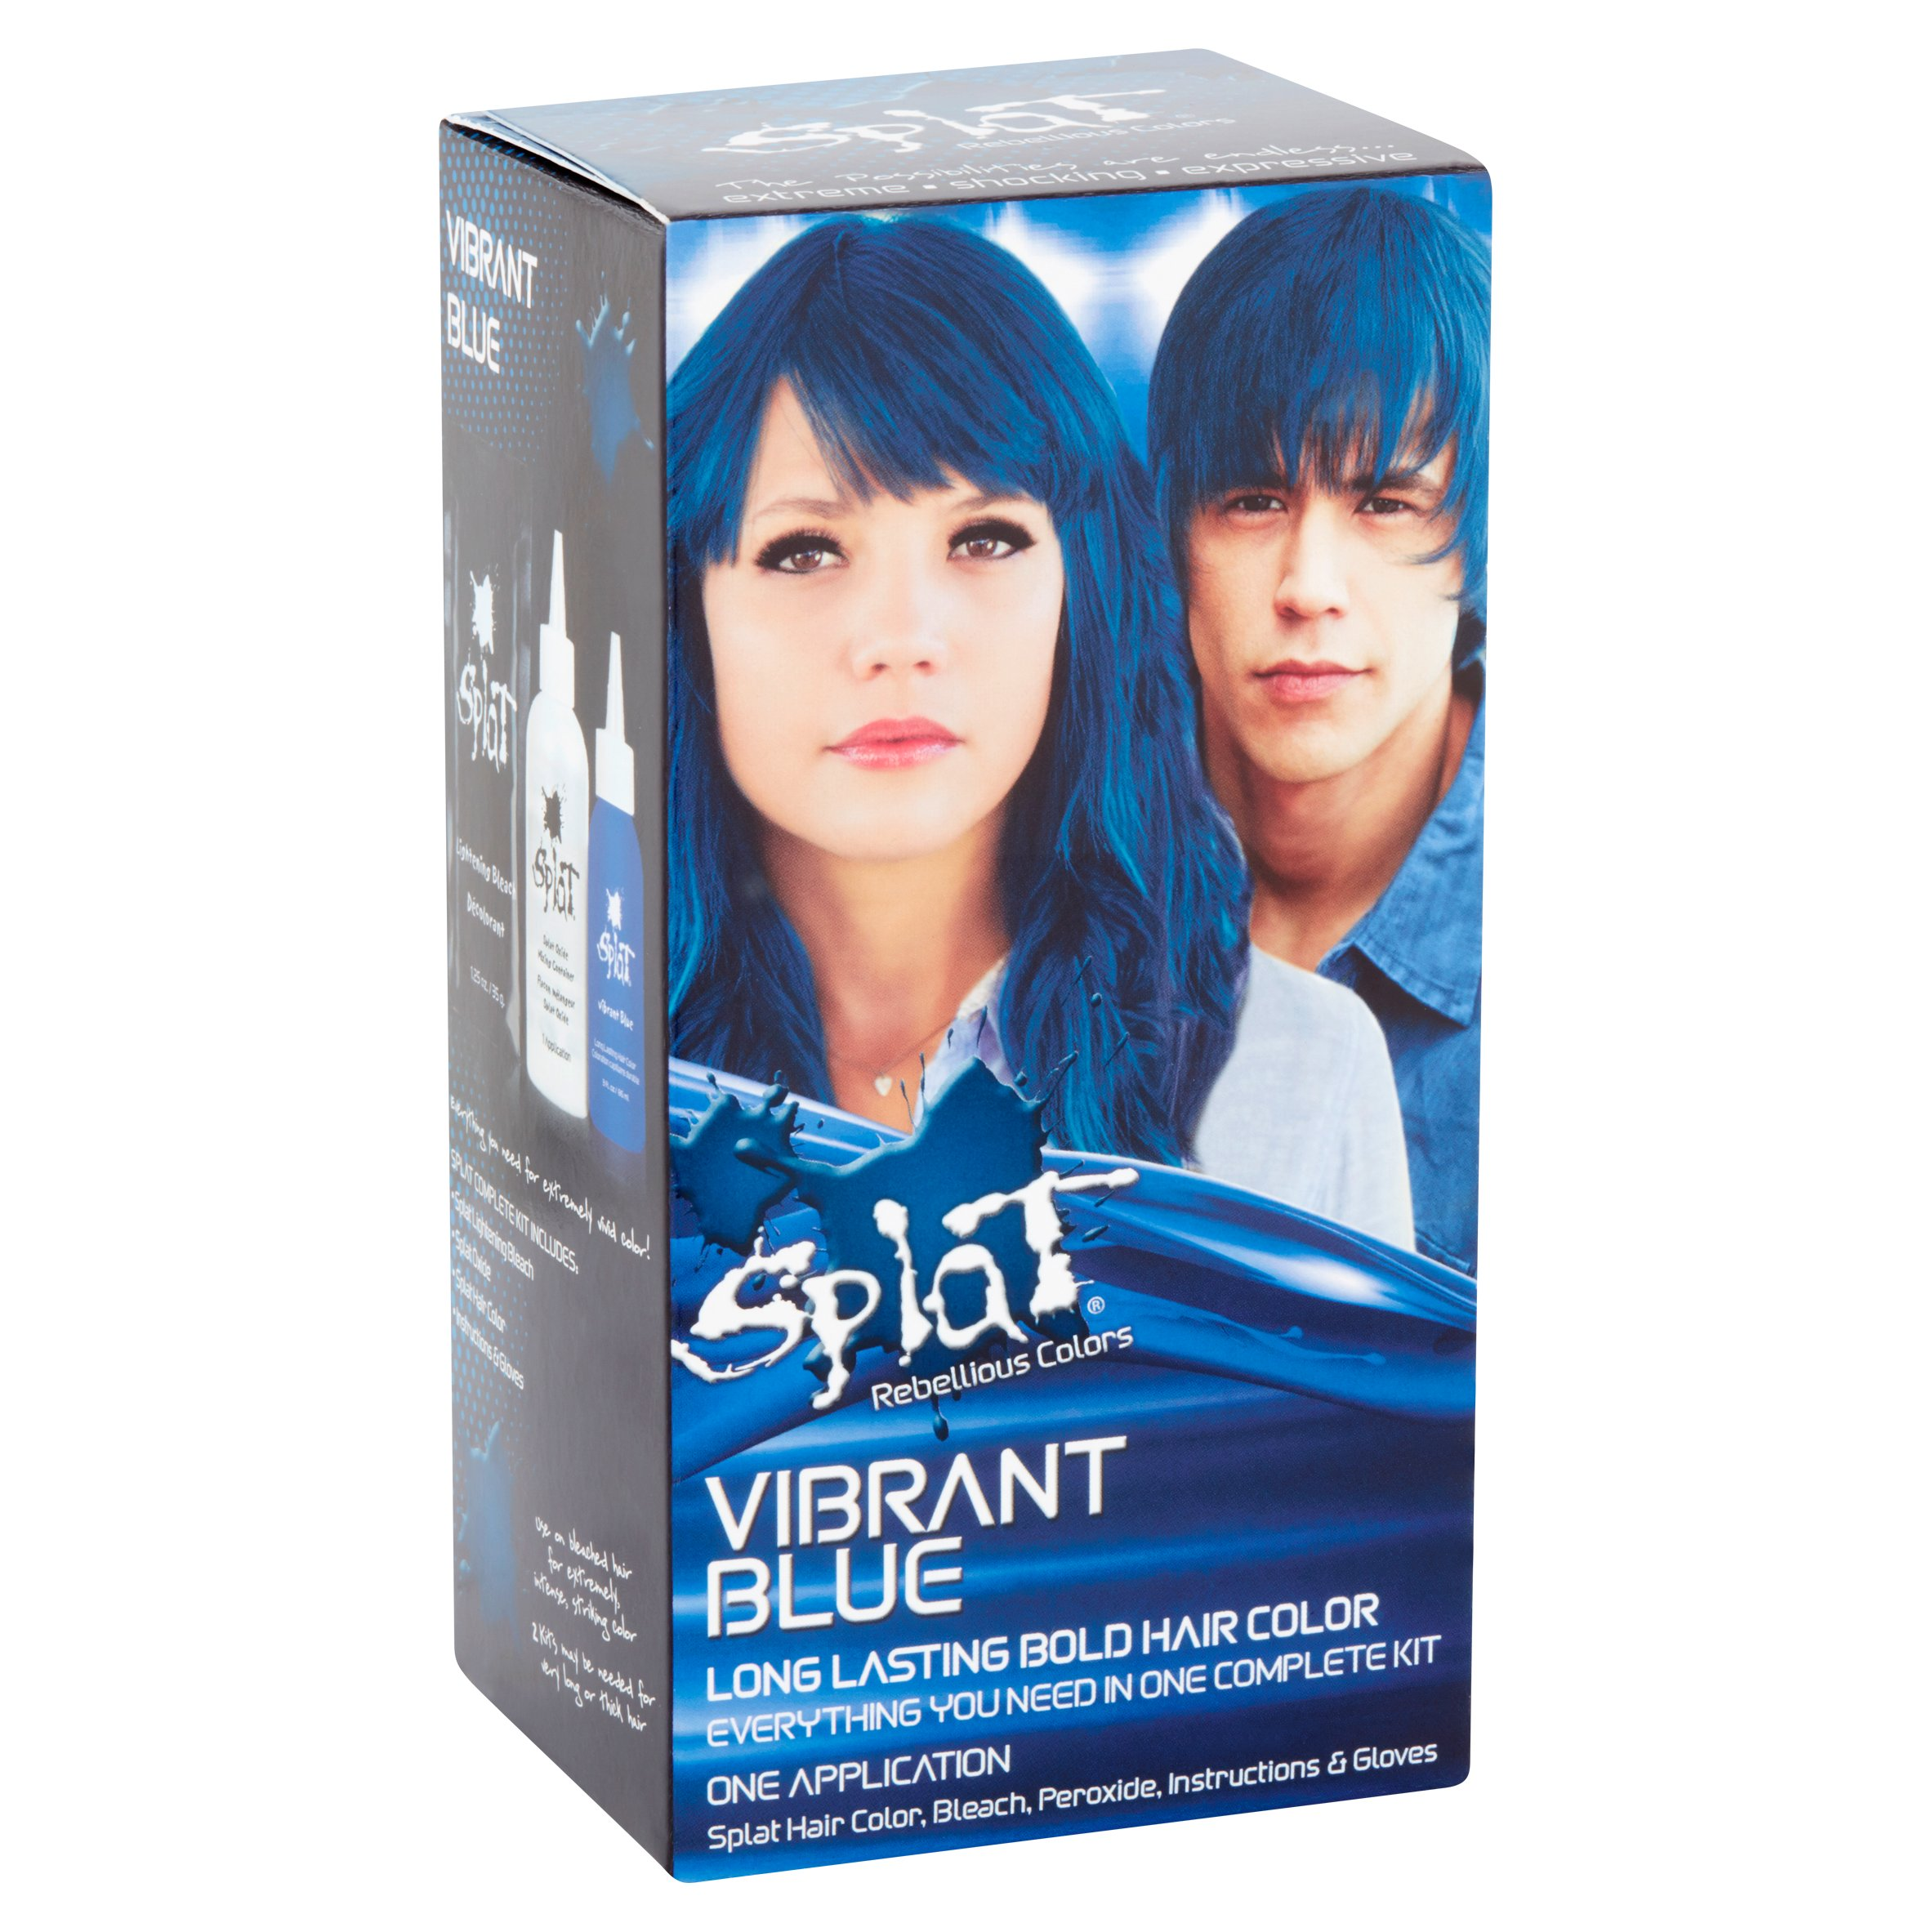 Splat Rebellious Colors Vibrant Blue Long Lasting Bold Hair Color